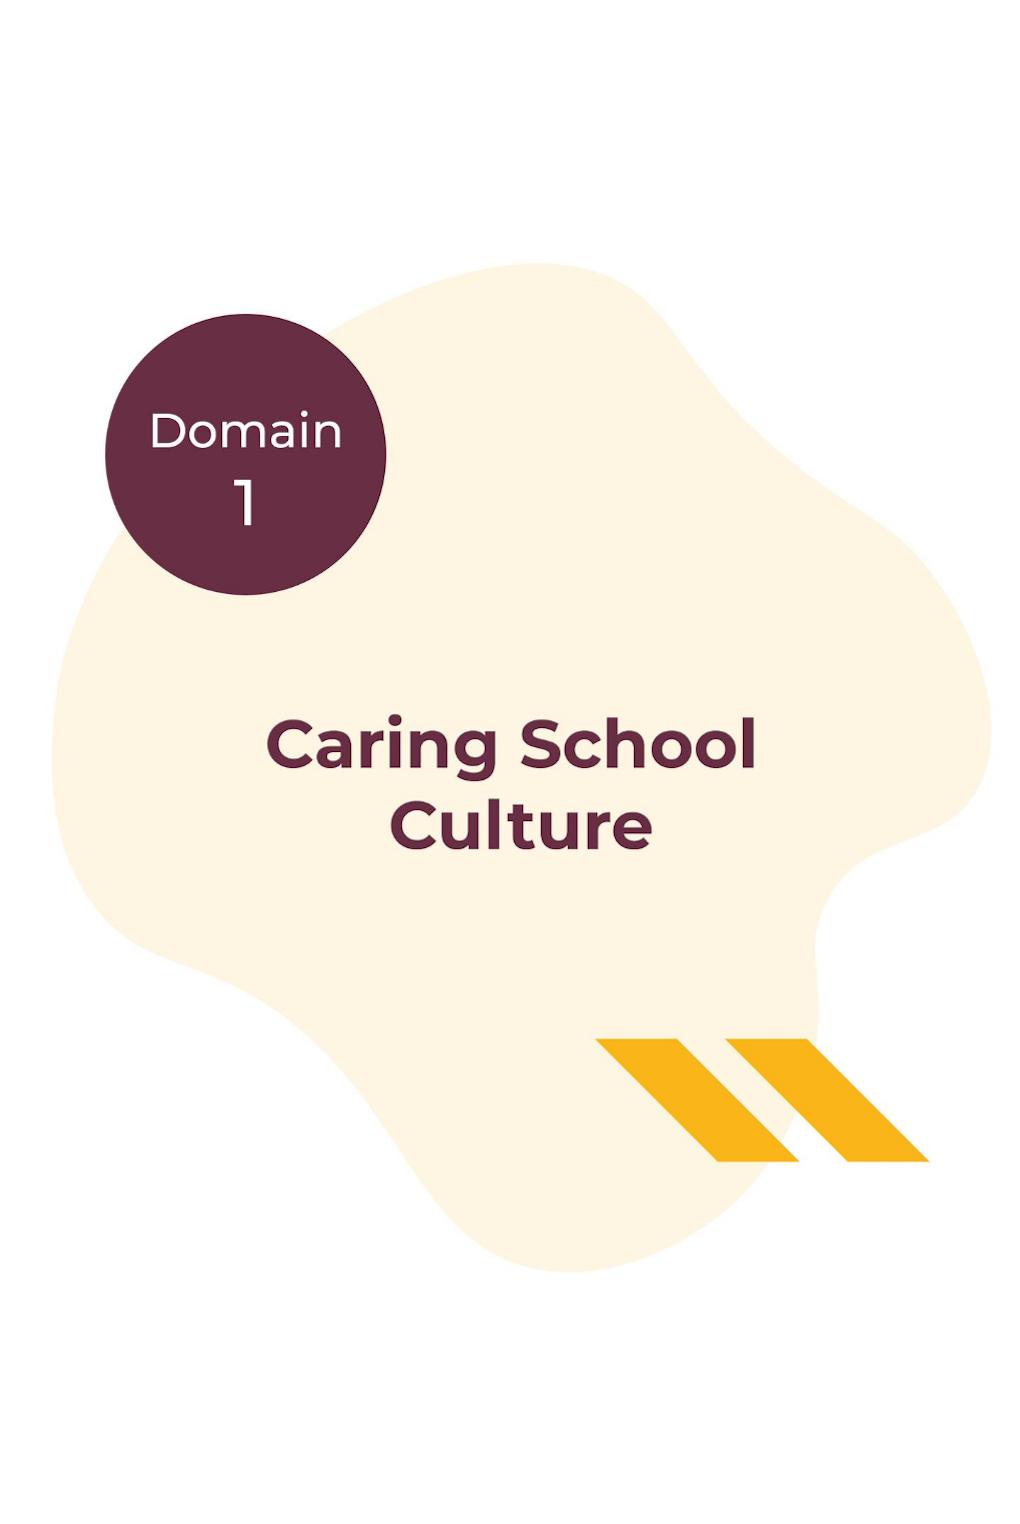 Domain 1 - Caring School Culture